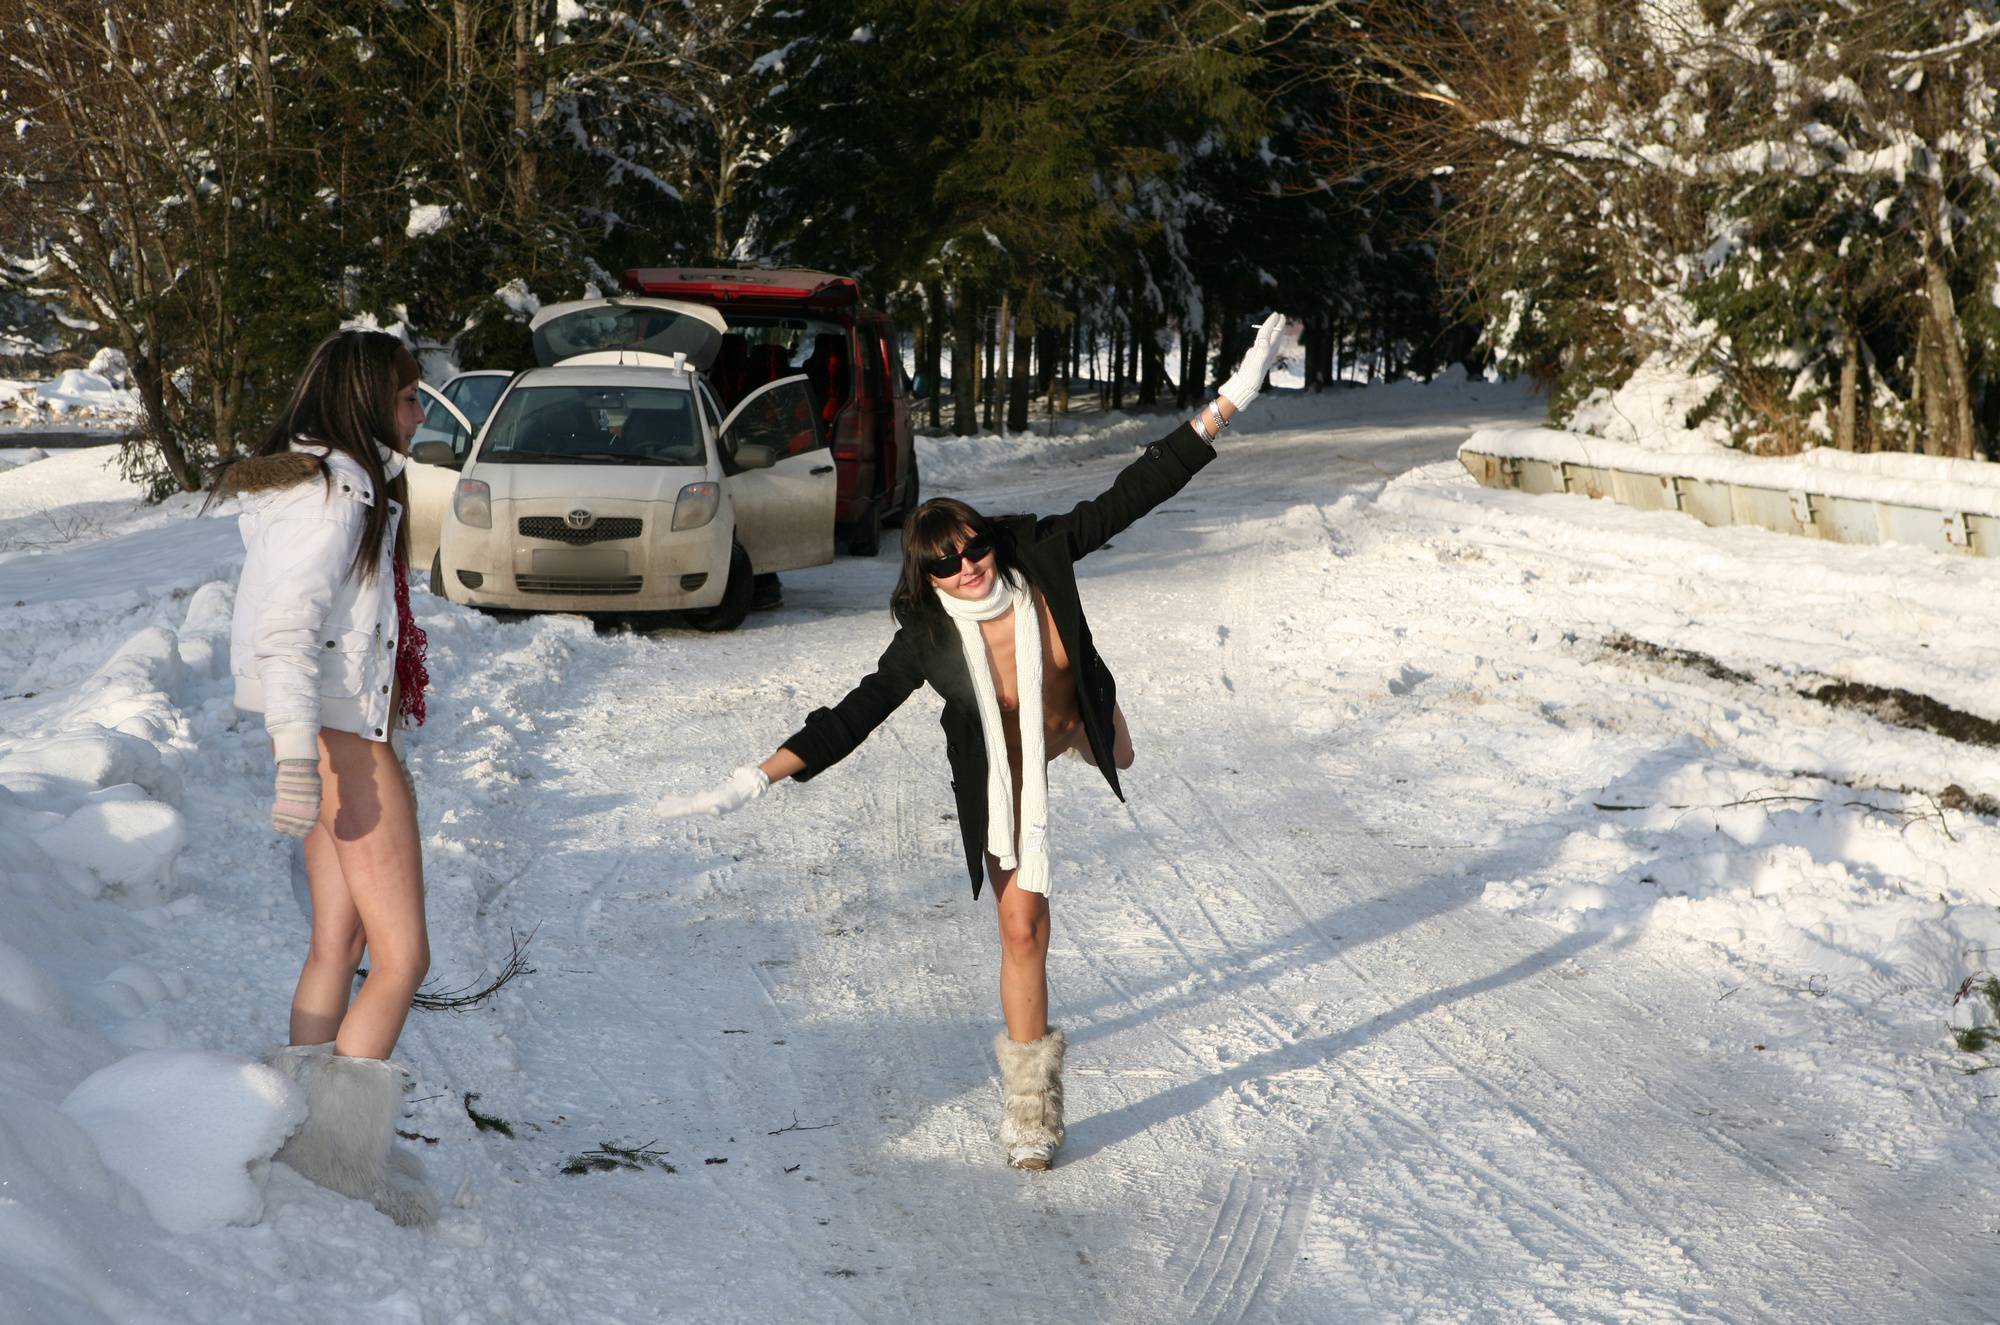 Purenudism Pics-Snow Day Winter Session - 2